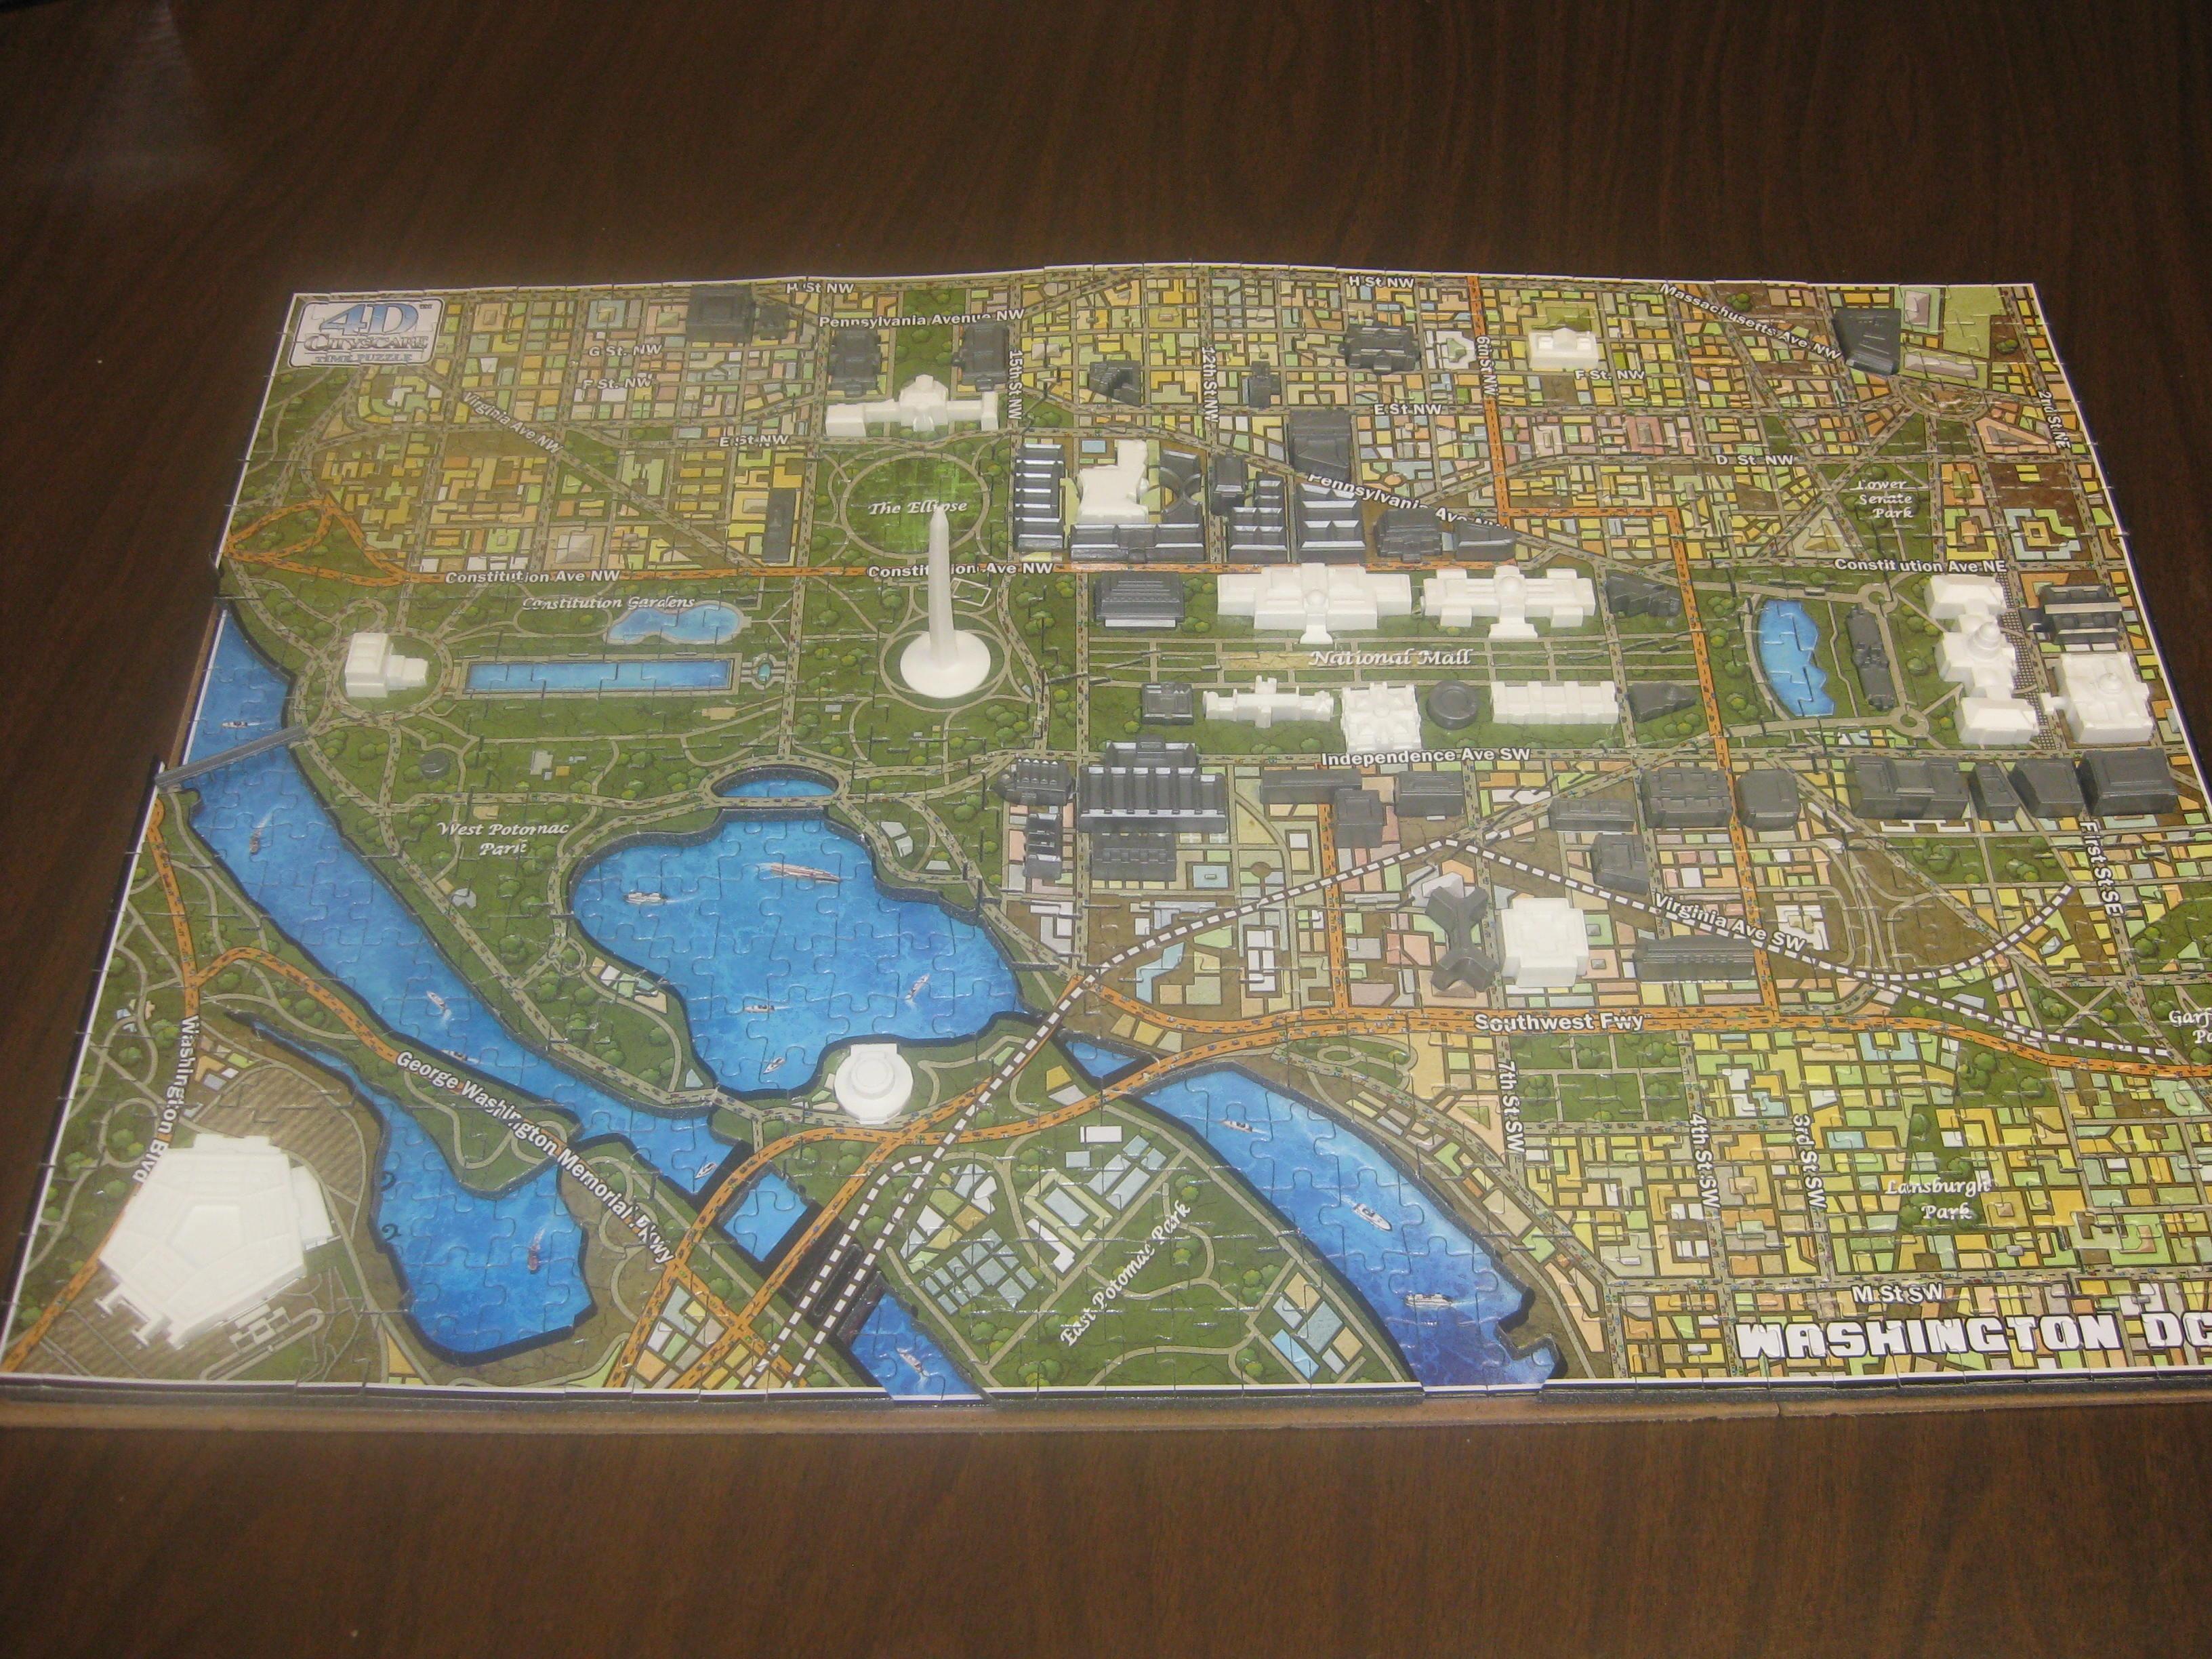 Washington D.C. puzzle completed